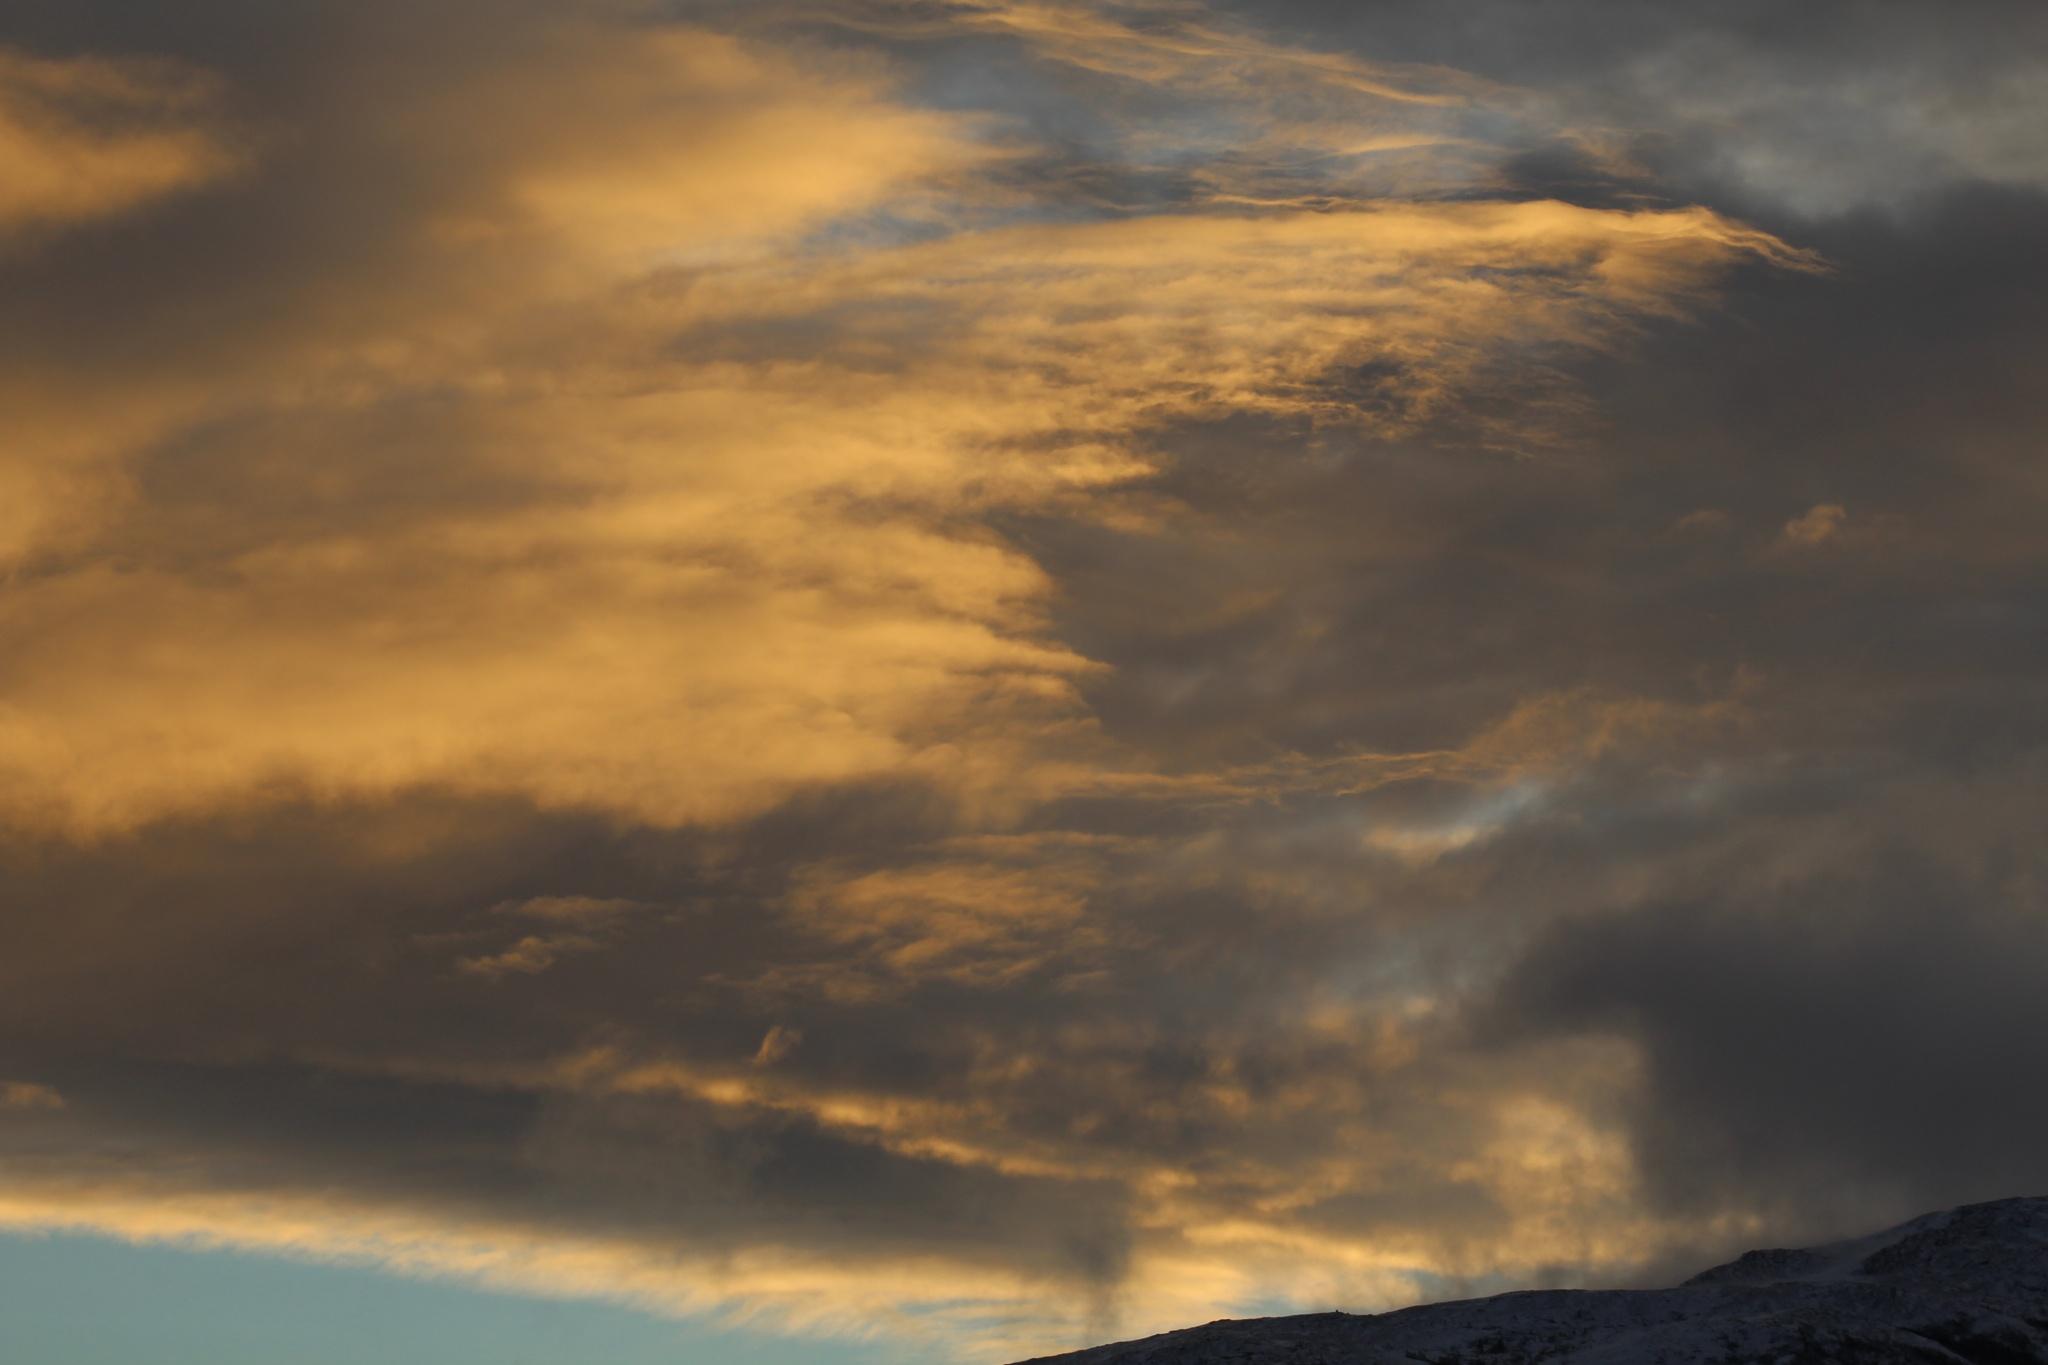 Winter sky in West Norway by Tor Johansen